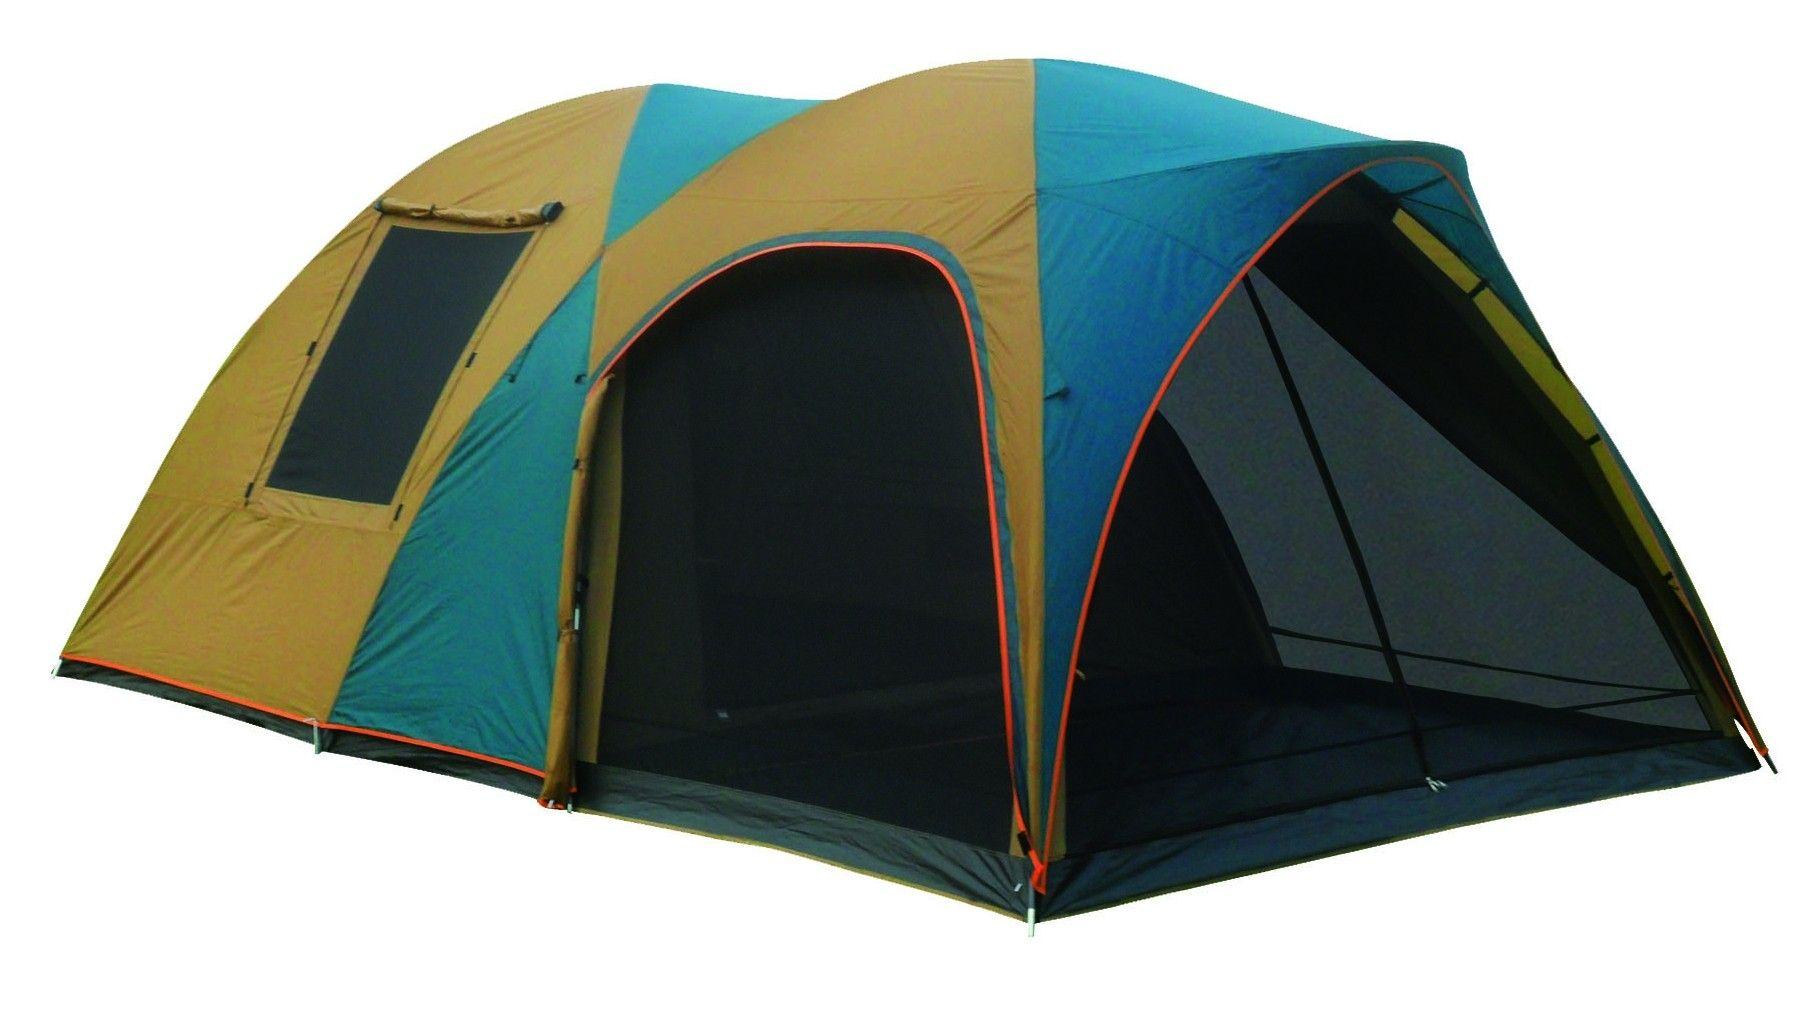 Koda Gear Double Dome 4 Person Tent  sc 1 st  Pinterest & Koda Gear Double Dome 4 Person Tent   Camping ideas   Pinterest ...